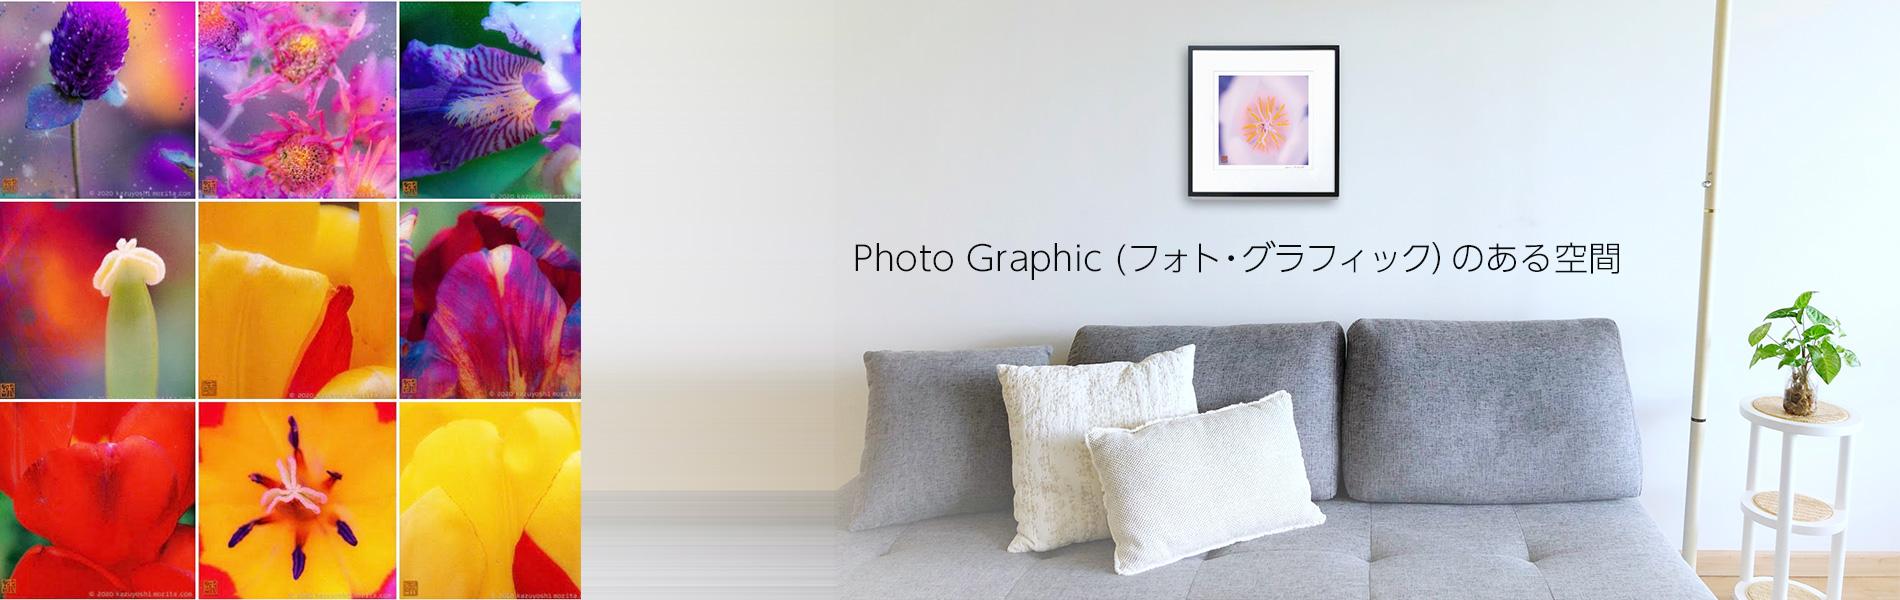 【Art beans】 Photo Graphic (フォト・グラフィック)のある空間